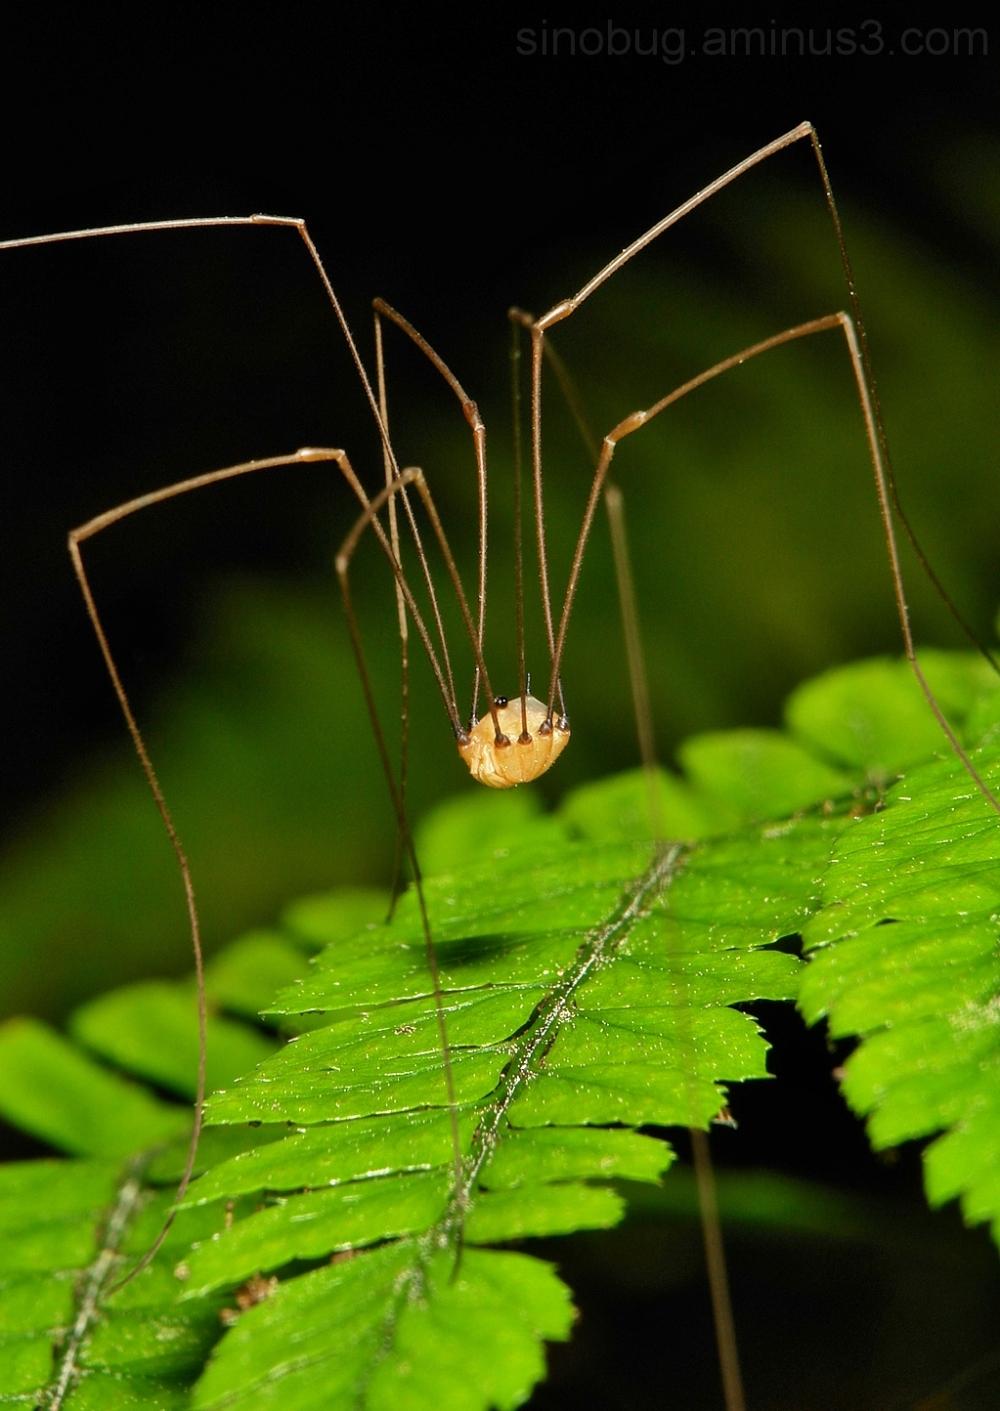 Harvestman Opiliones Eupnoi arachnid